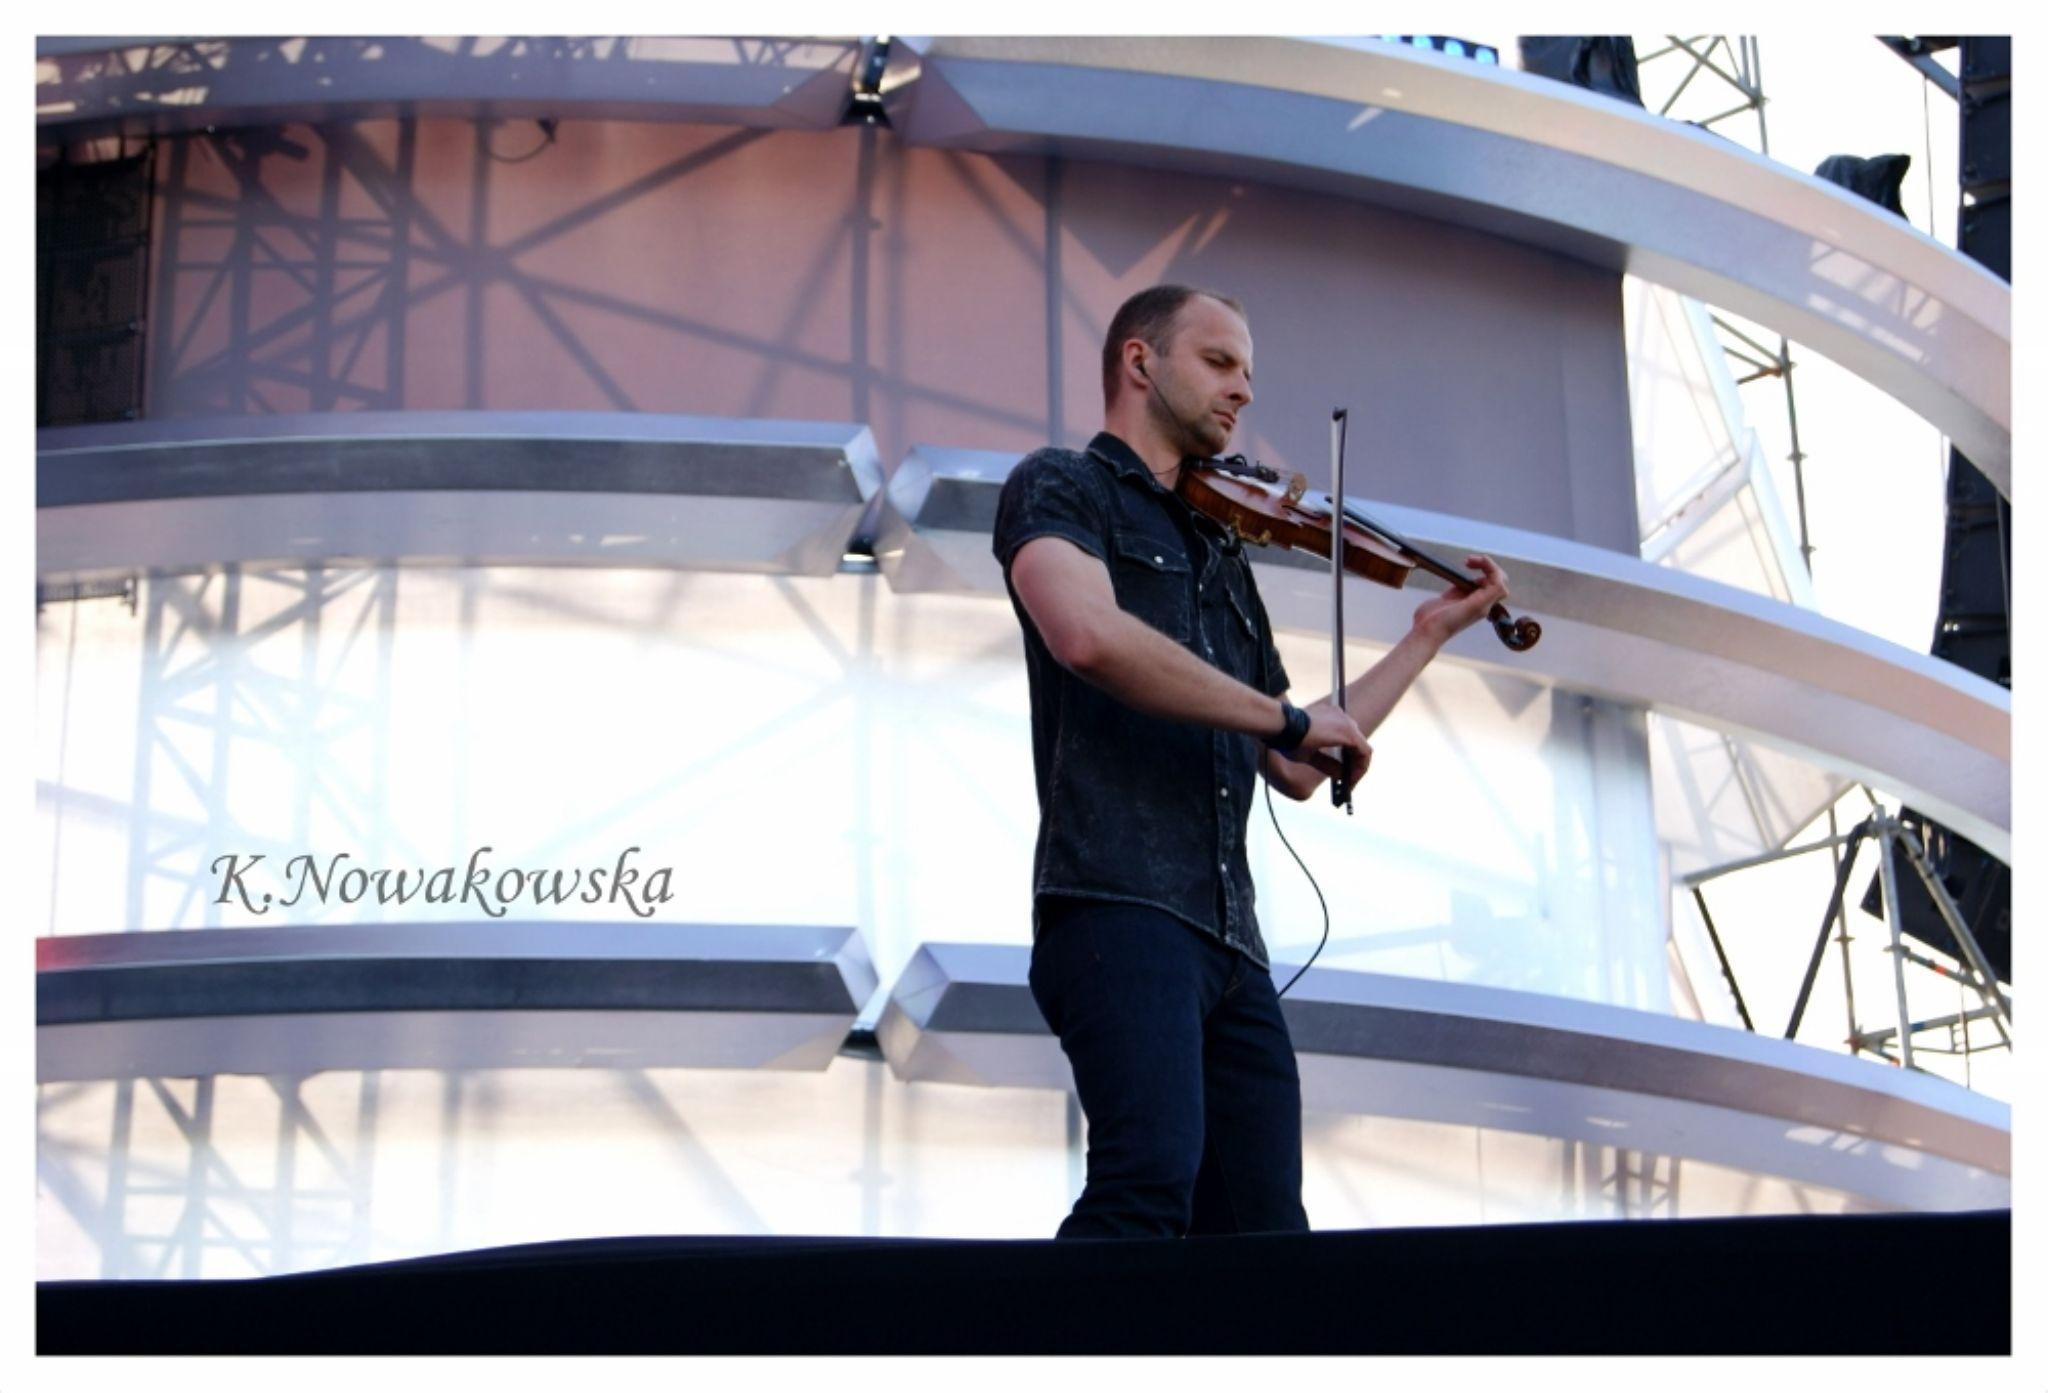 holidays concert by Kinga Nowakowska